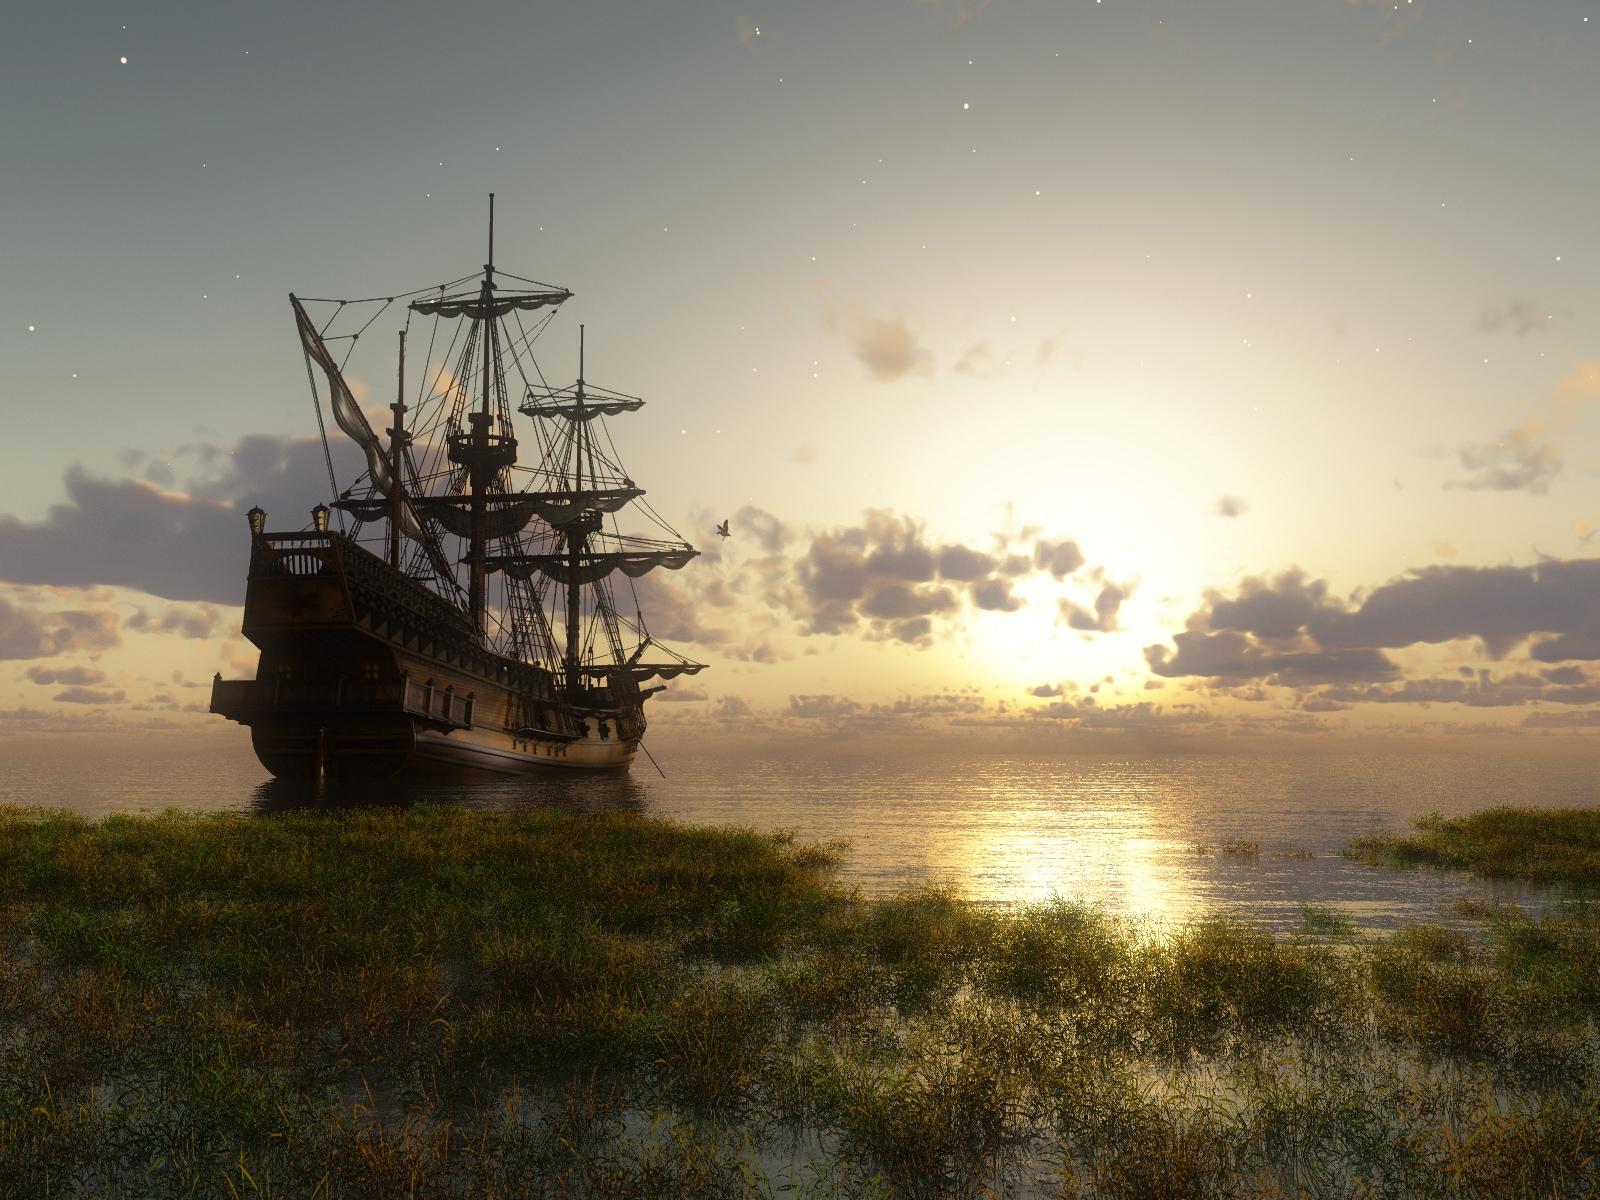 http://2.bp.blogspot.com/-nQ9fHltQk1o/TdrKDviuwSI/AAAAAAAAAJg/jyhnwlCM92g/s1600/35_Great_3D_Sailing_Ships_Wallpapers-.jpg